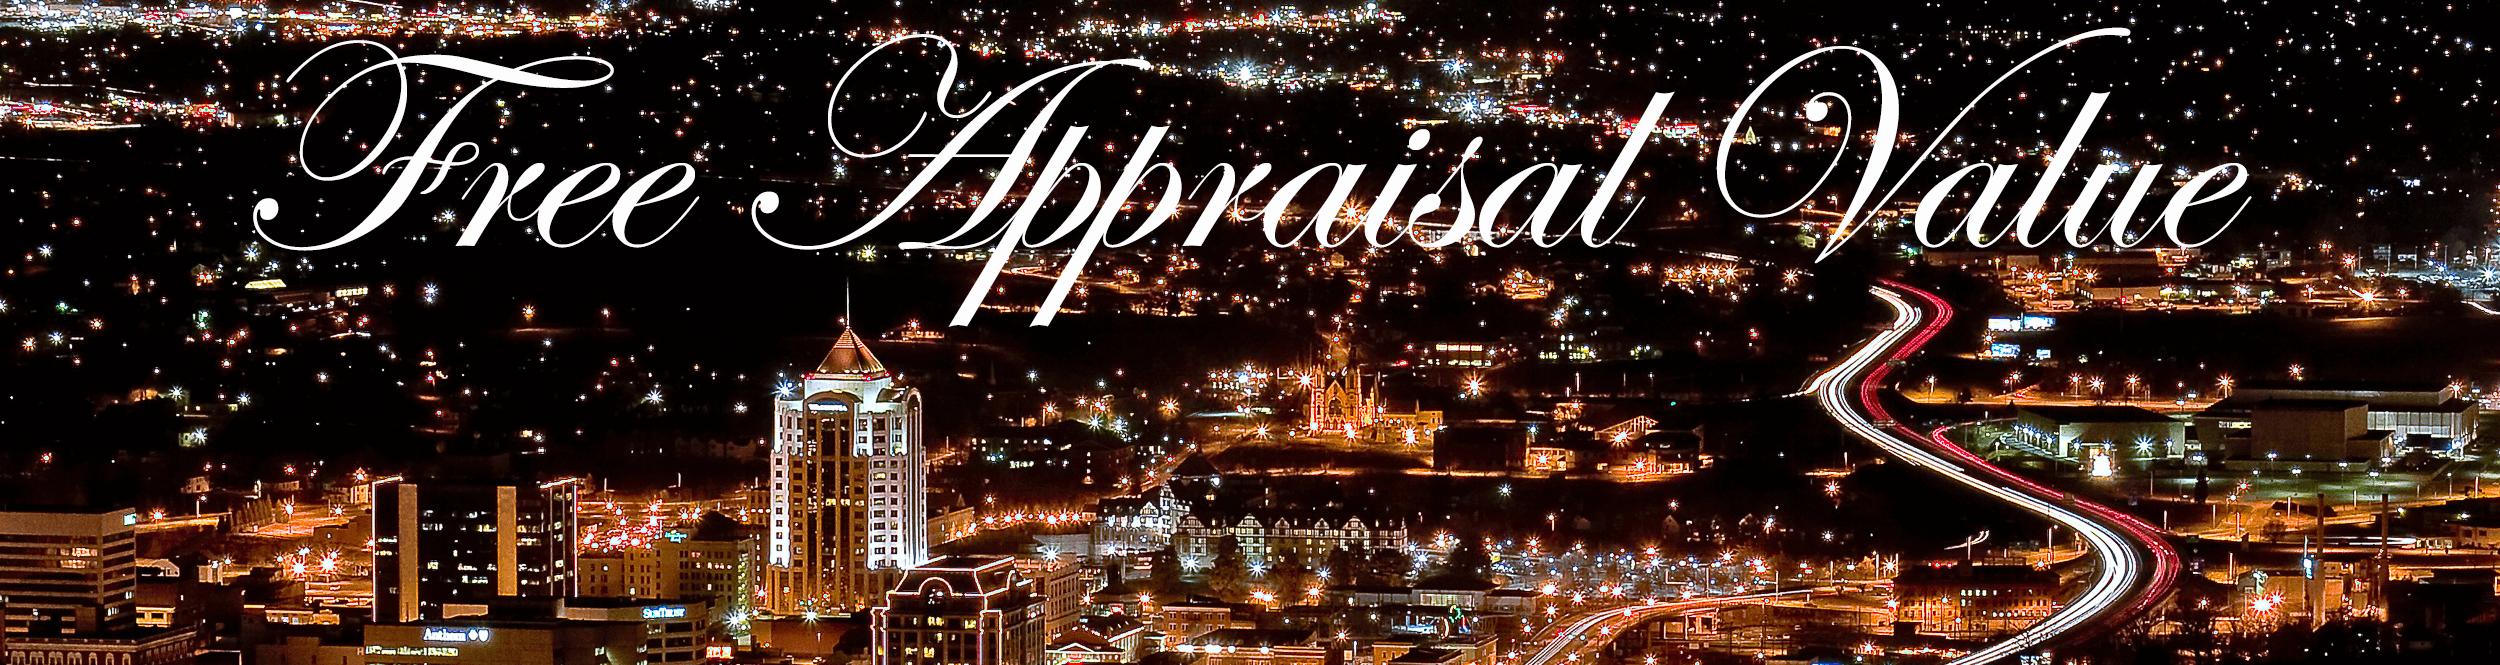 Appraisal Narrow image